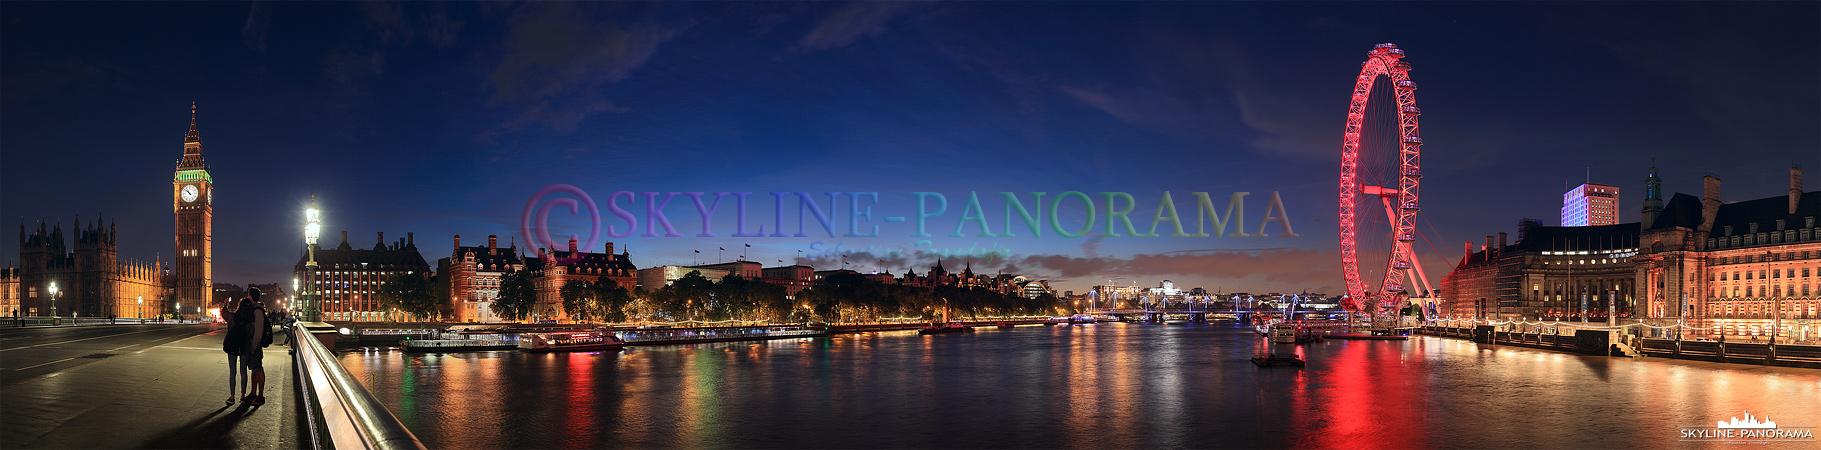 Panorama - Big Ben and London Eye